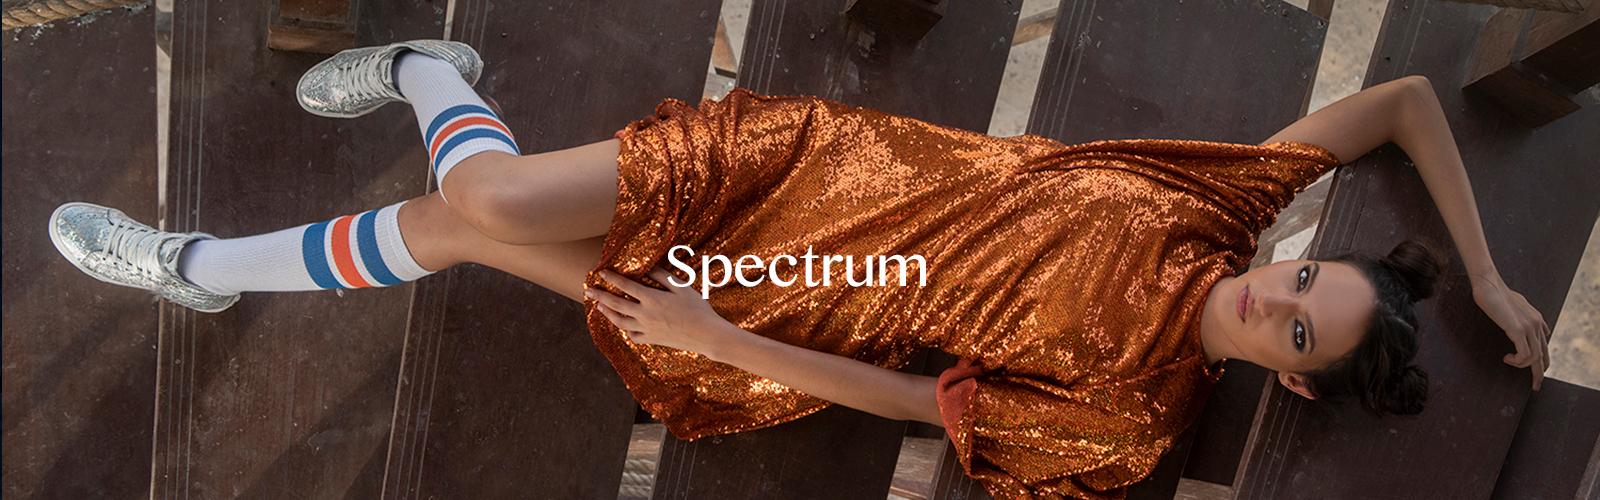 Spectrum-header-with-text